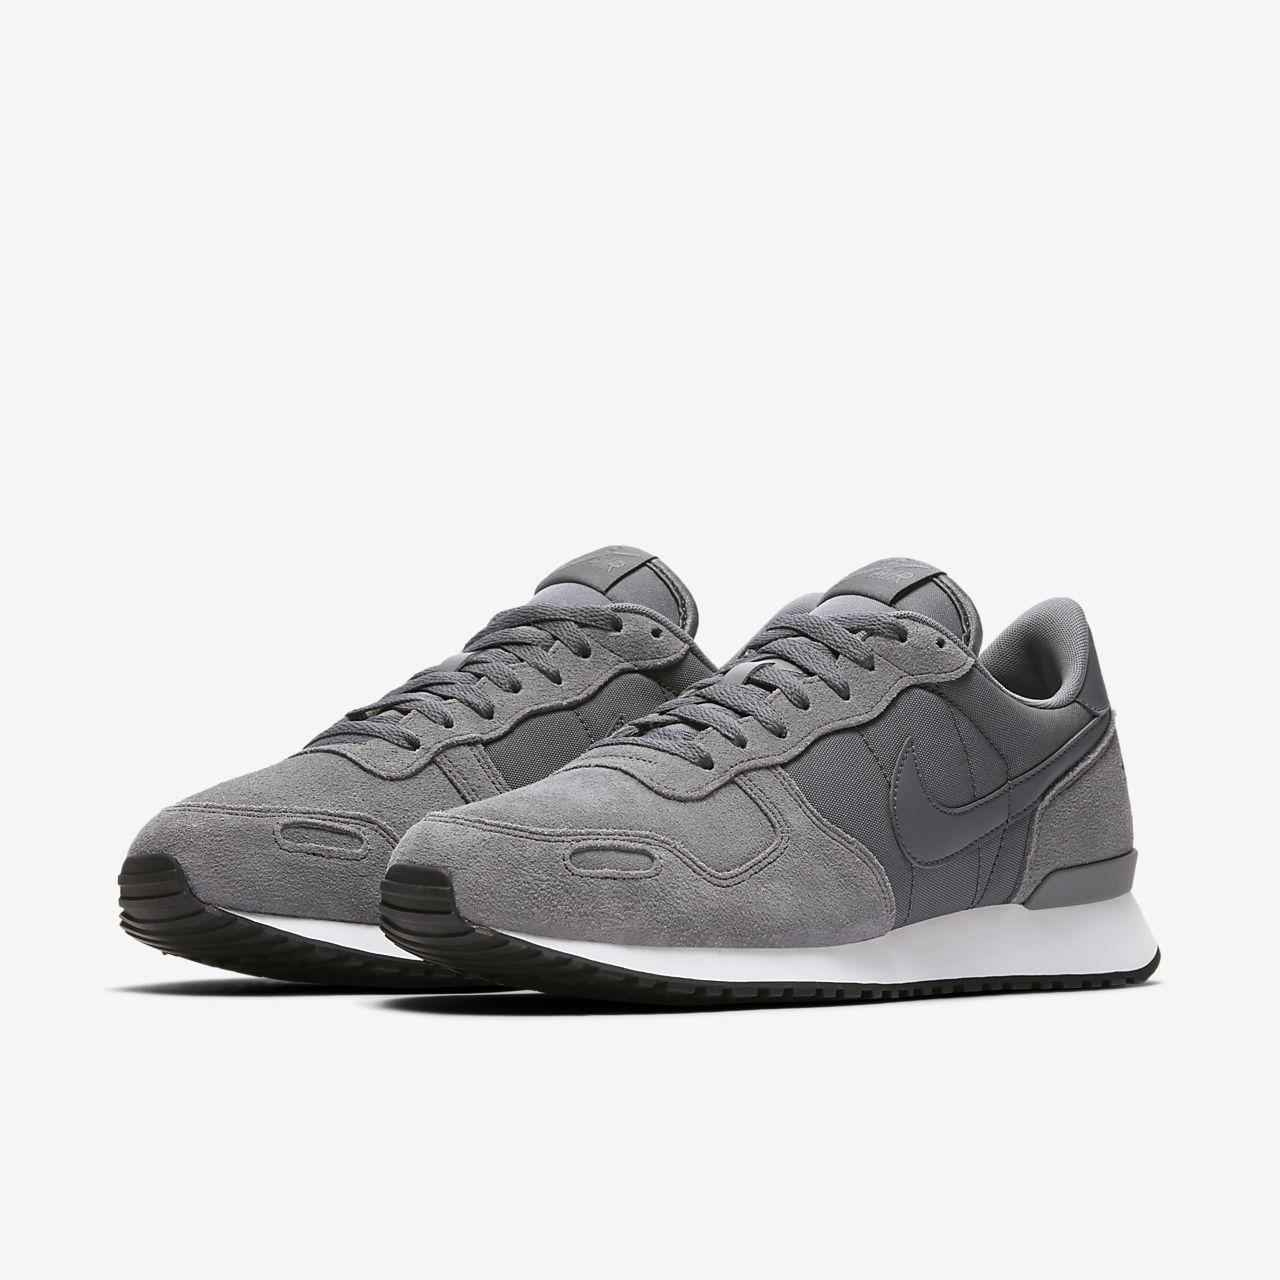 Nike Cuir Vortex D'air En Marche Schoenen Ee 9TAxcX9qQ